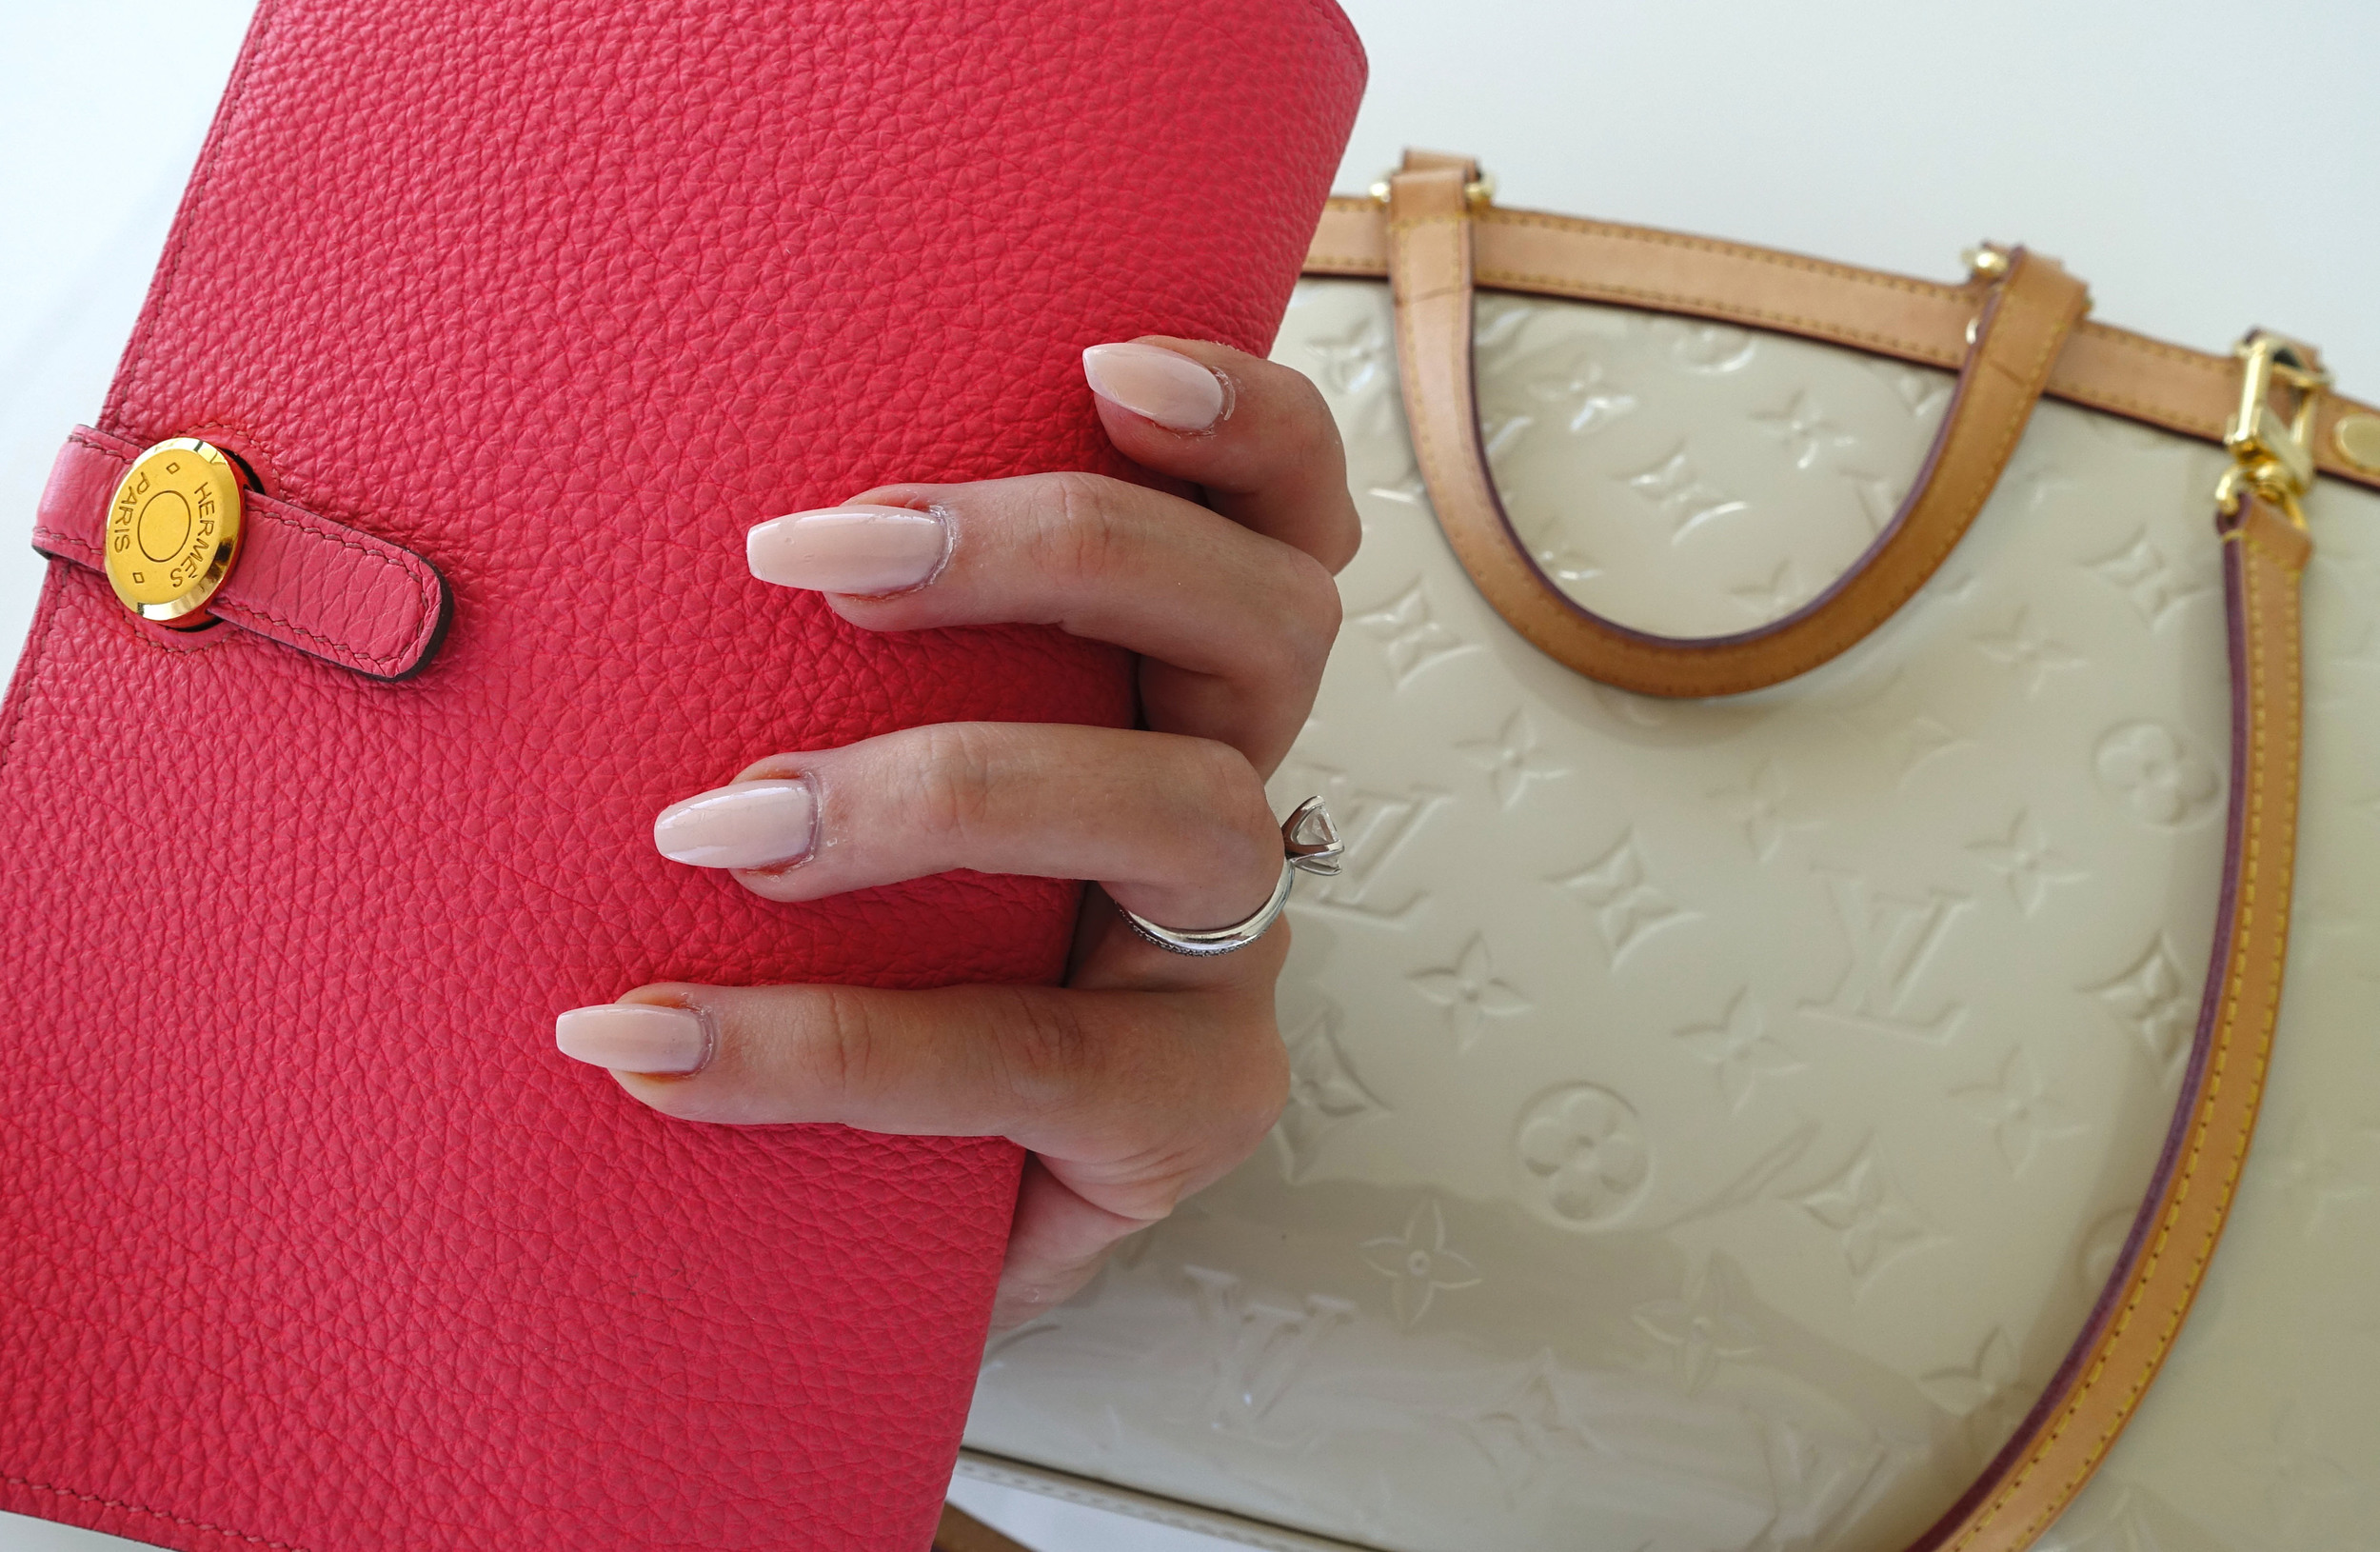 pink dogon hermes coffin nails louis vuitton bag